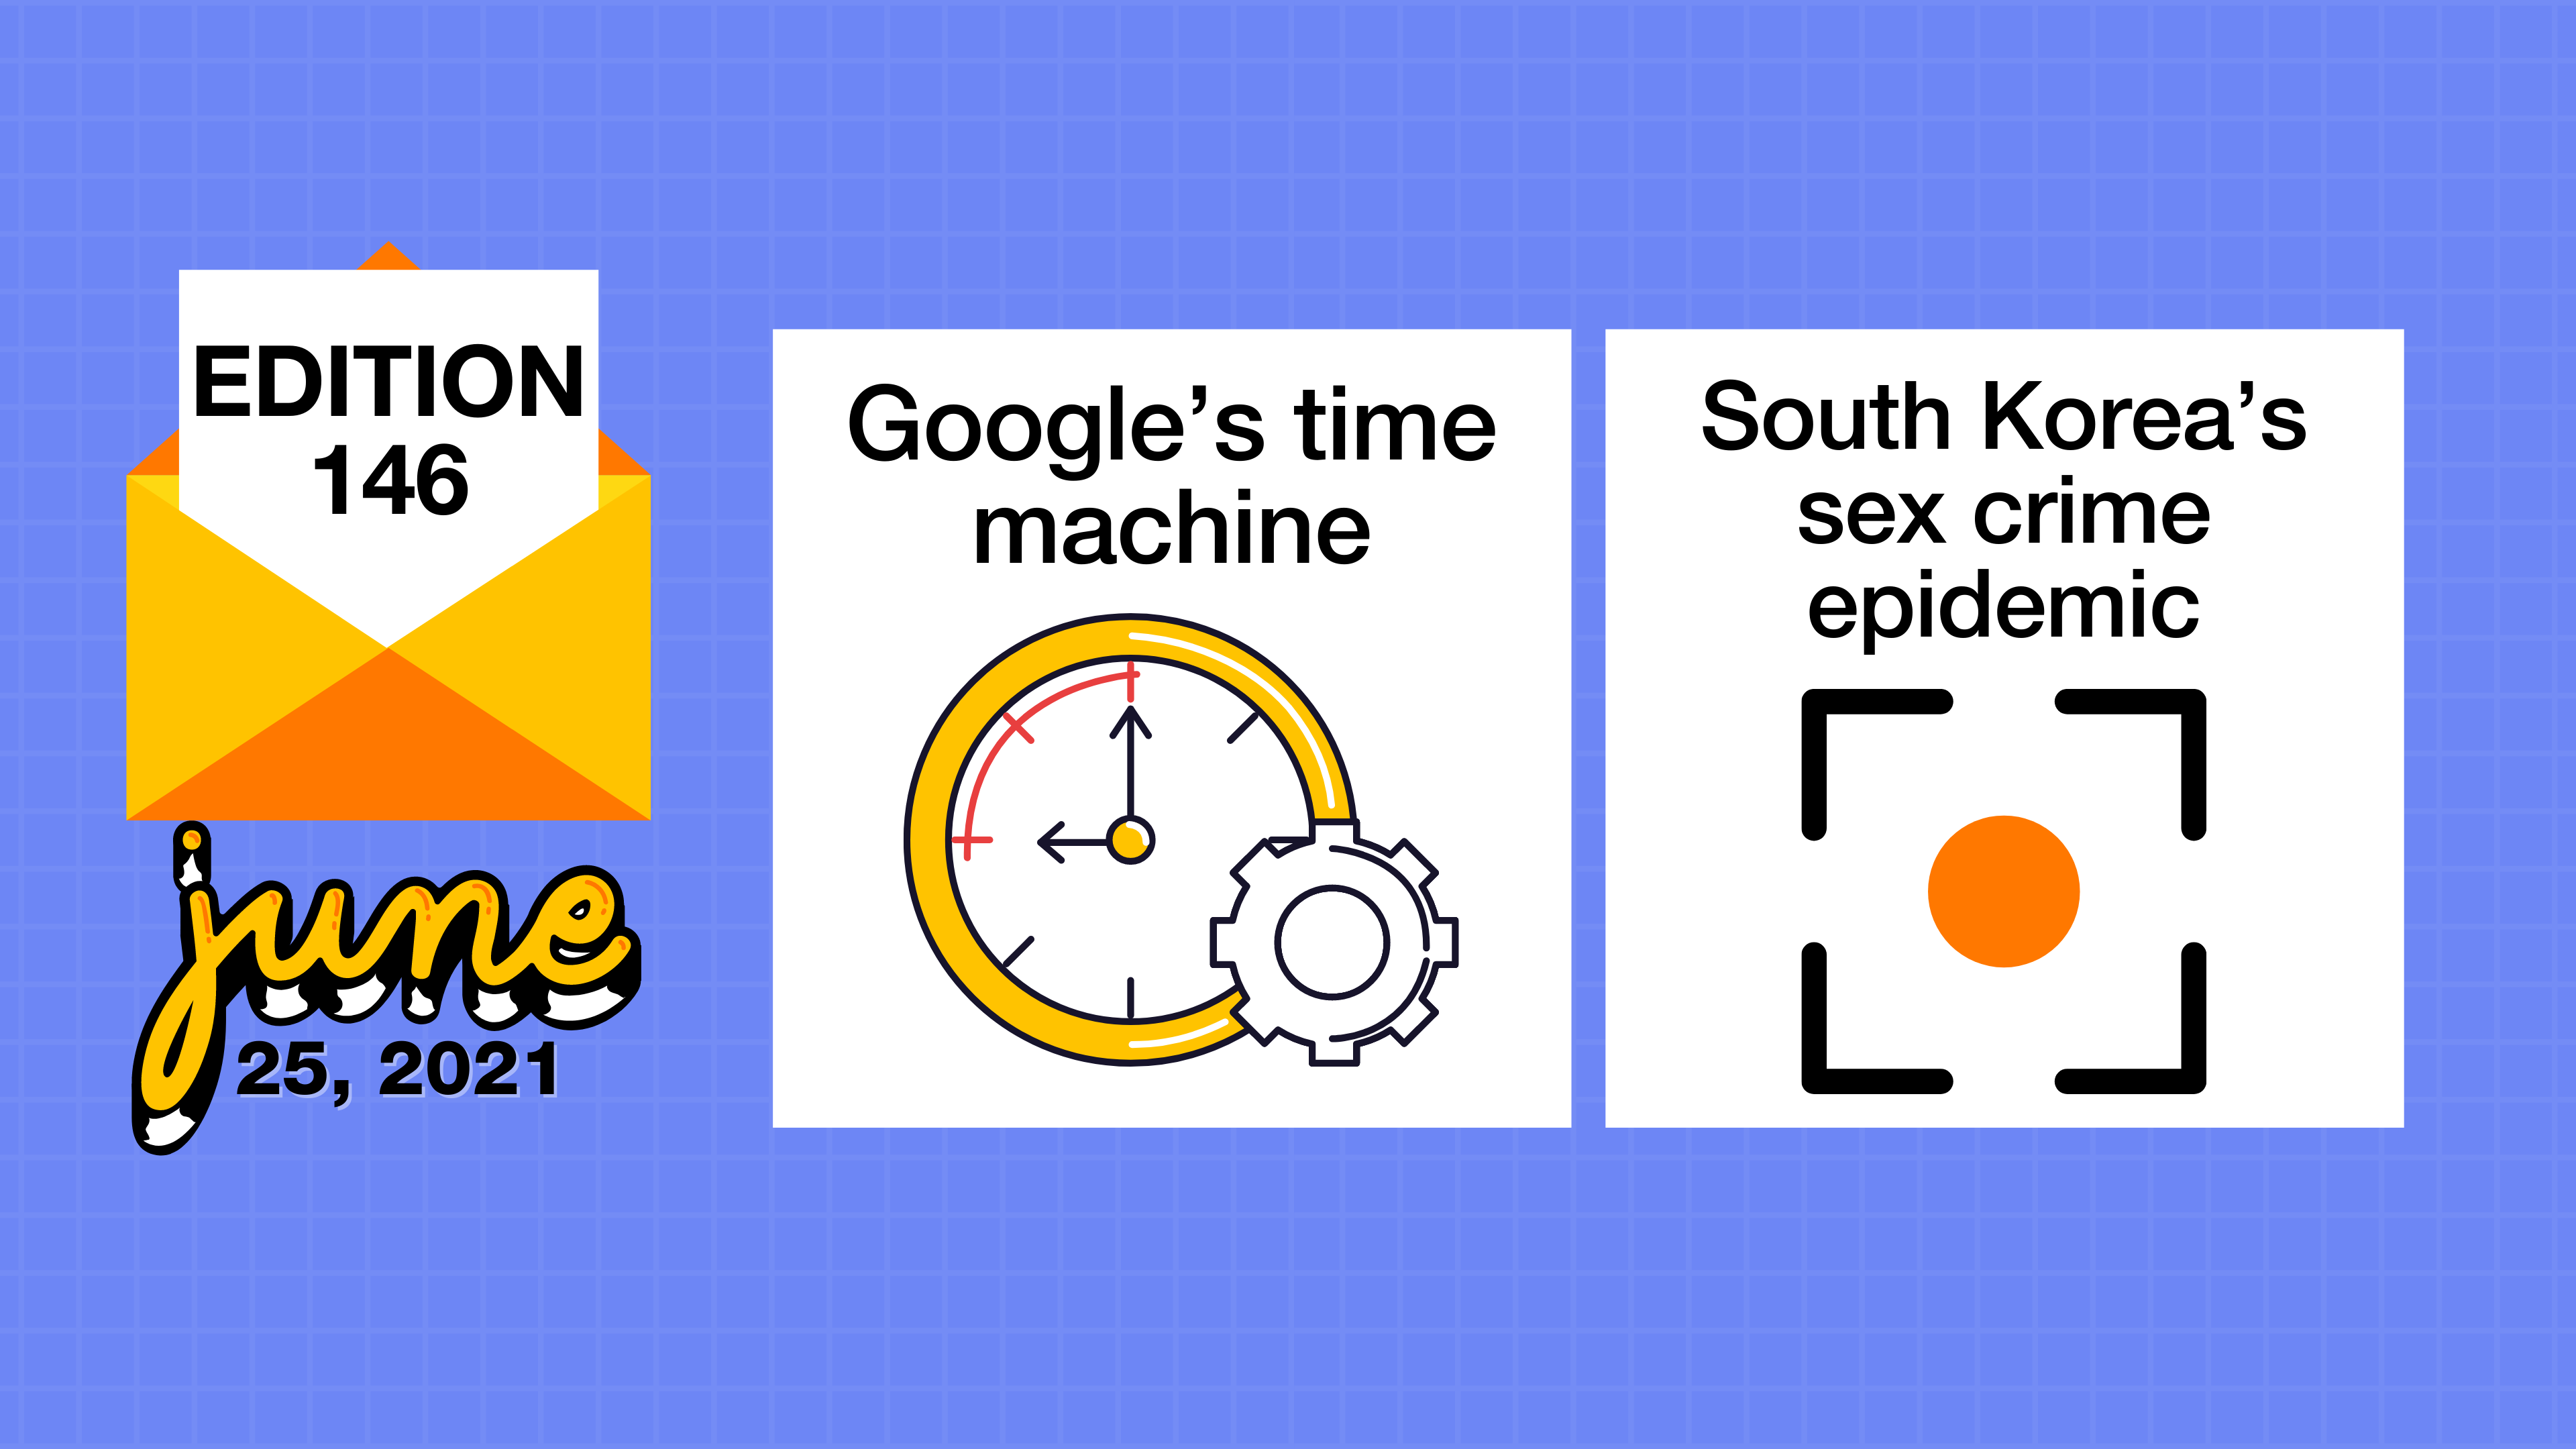 Google's time machine and South Korea's sex crime epidemic